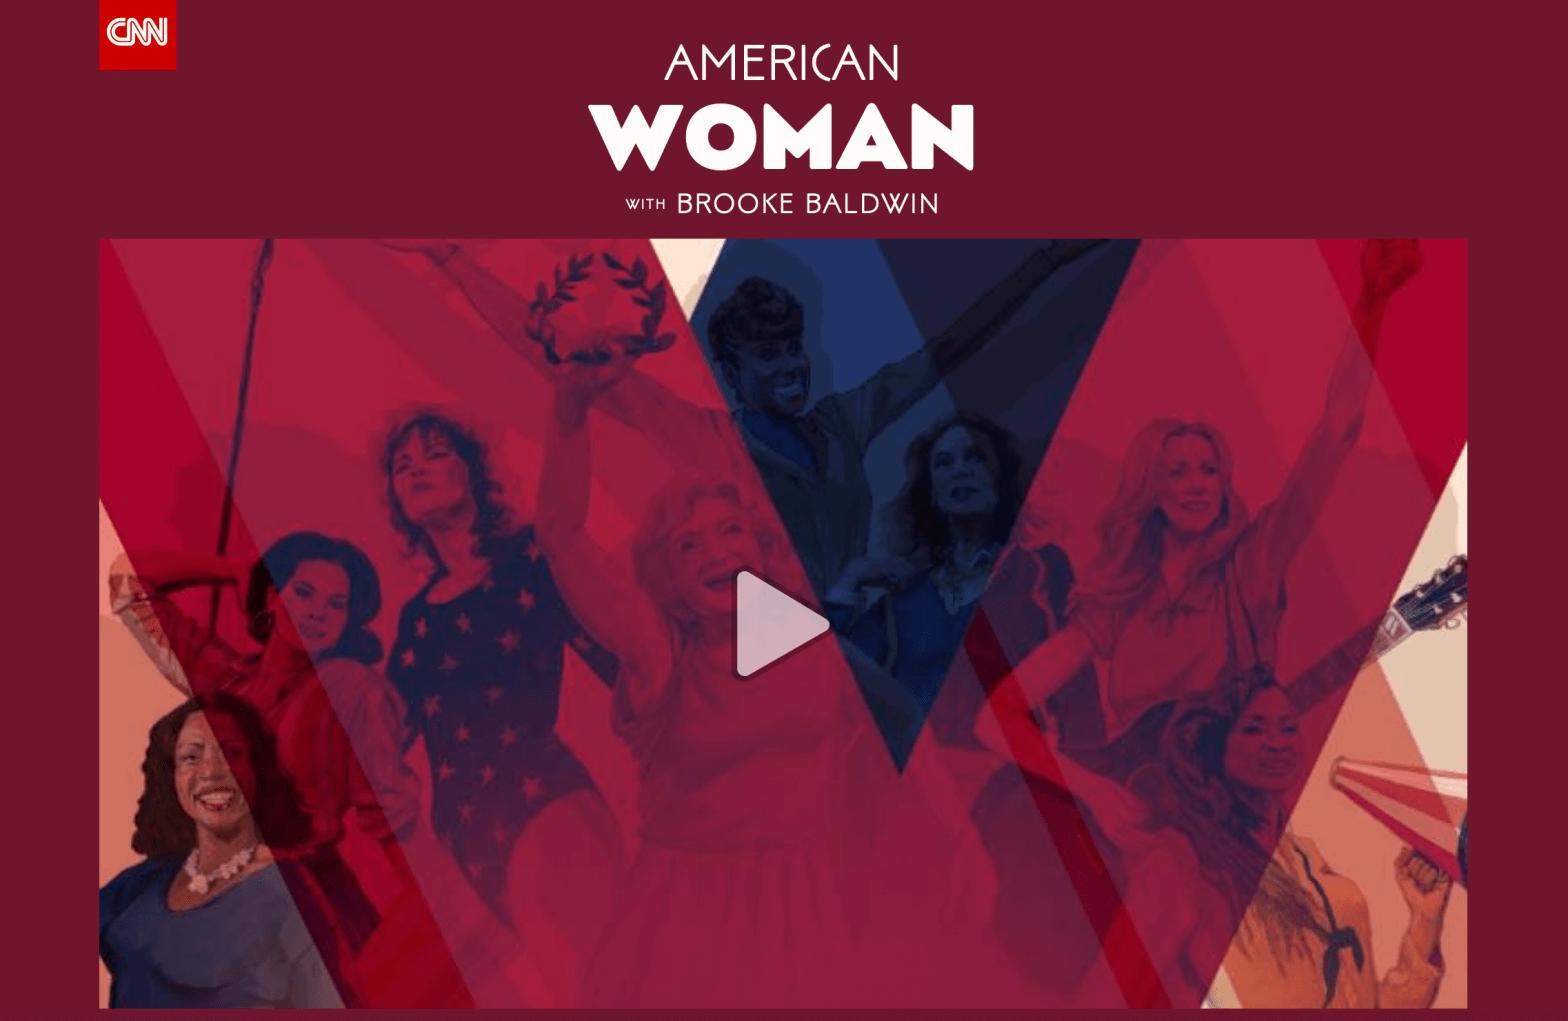 American Woman with Brooke Baldwin